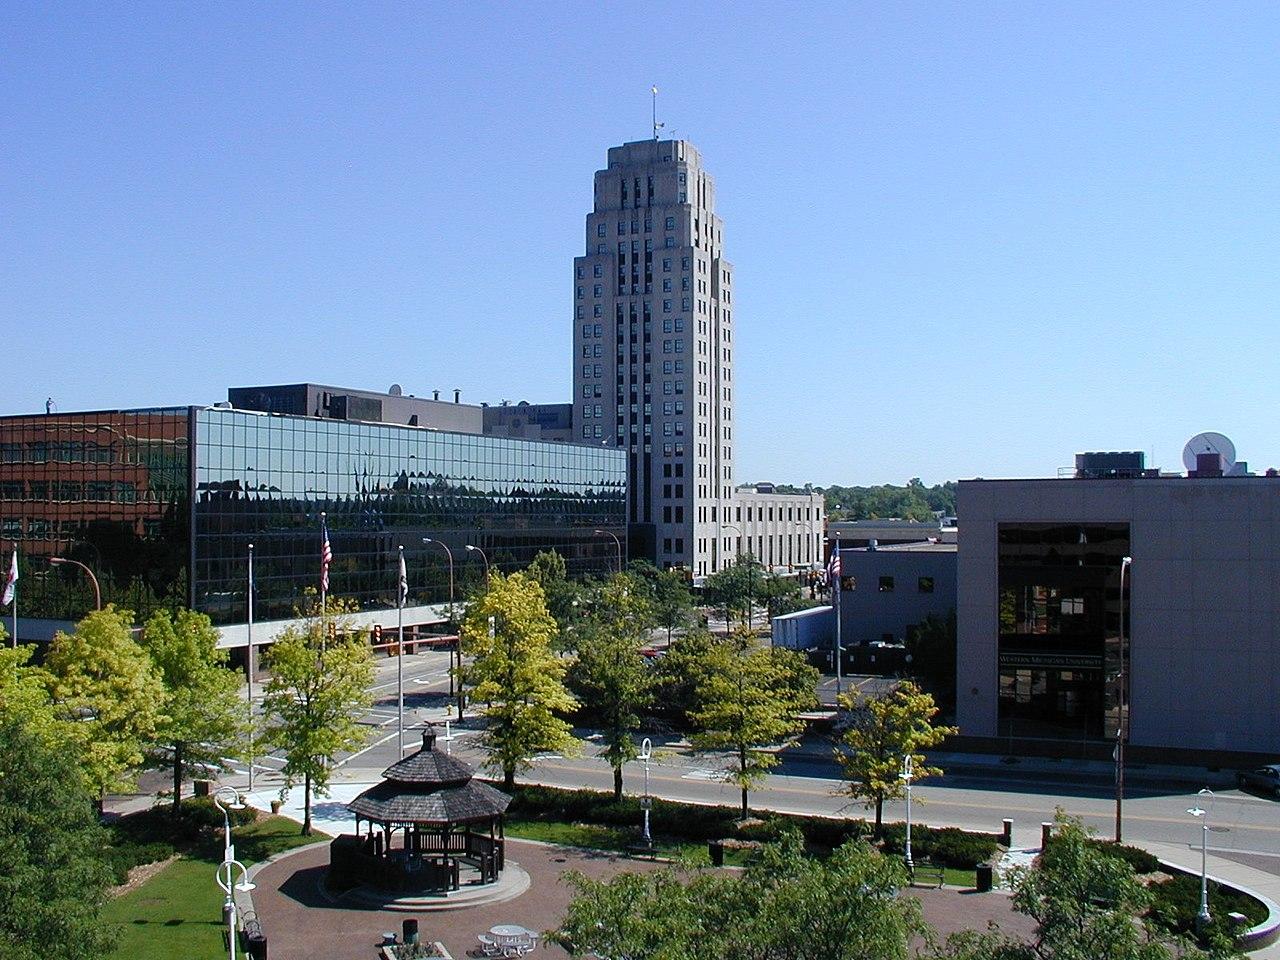 Federal Center in downtown Battle Creek, Michigan